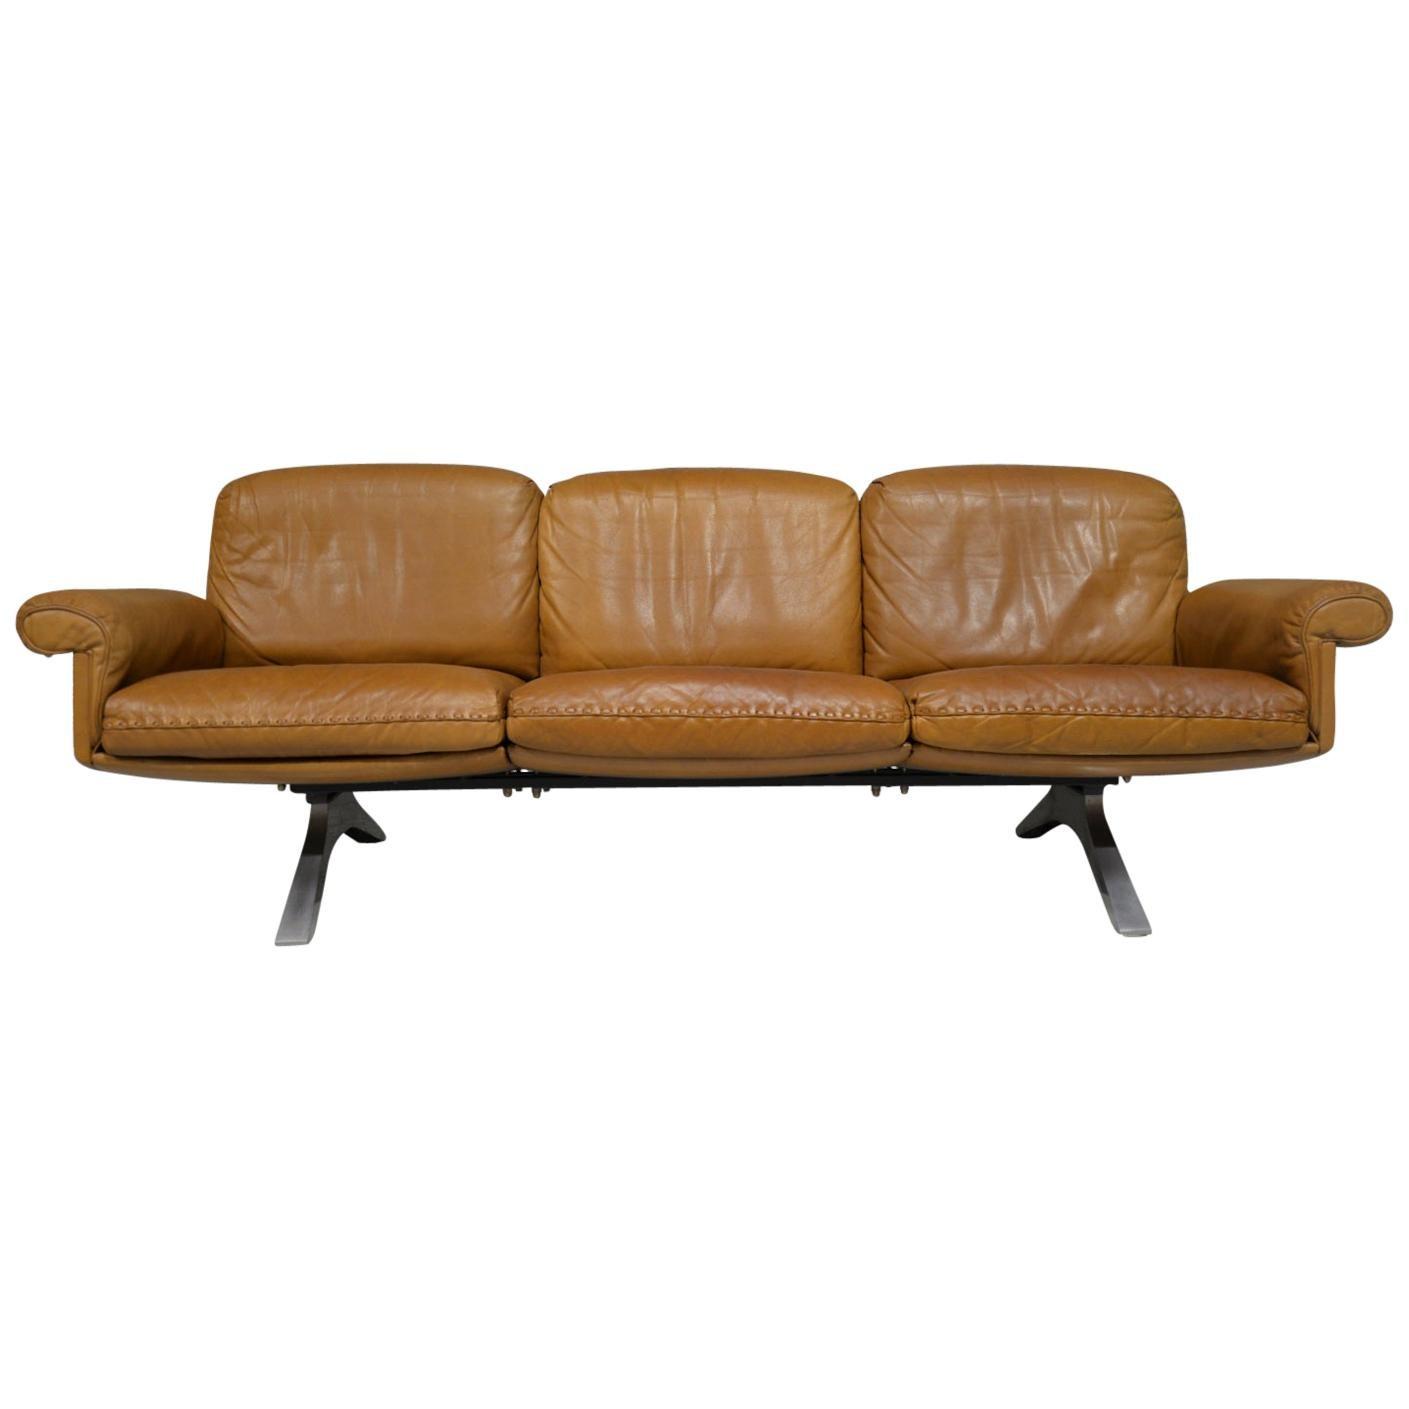 Vintage De Sede DS 31 Leather Three-Seat Sofa, Switzerland 1970s